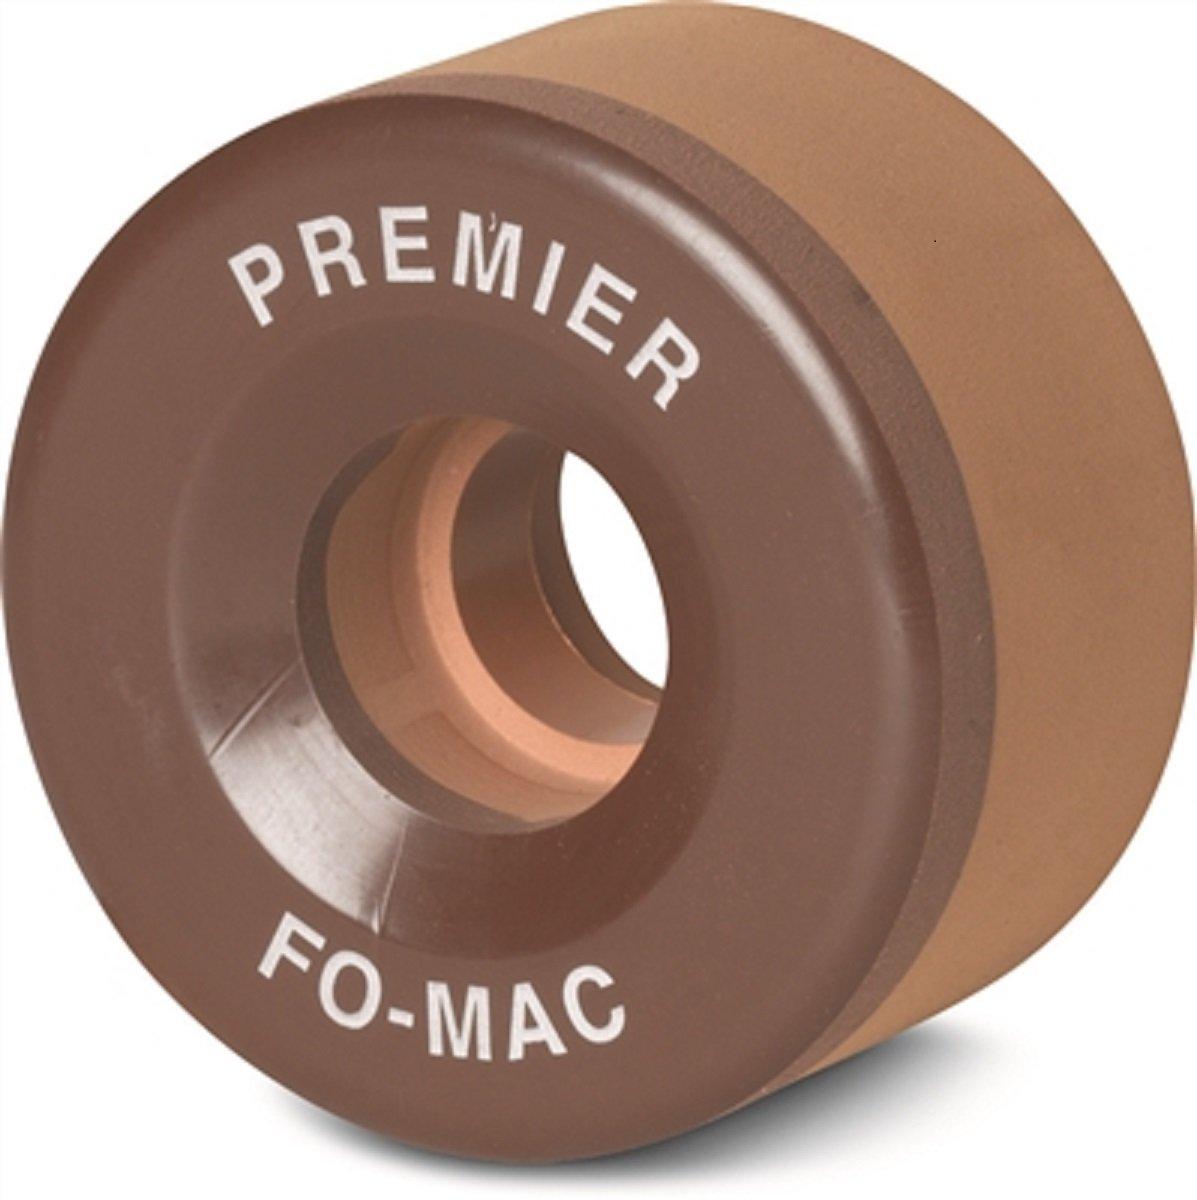 Fomac Premier Wheels Brown by Fo-Mac